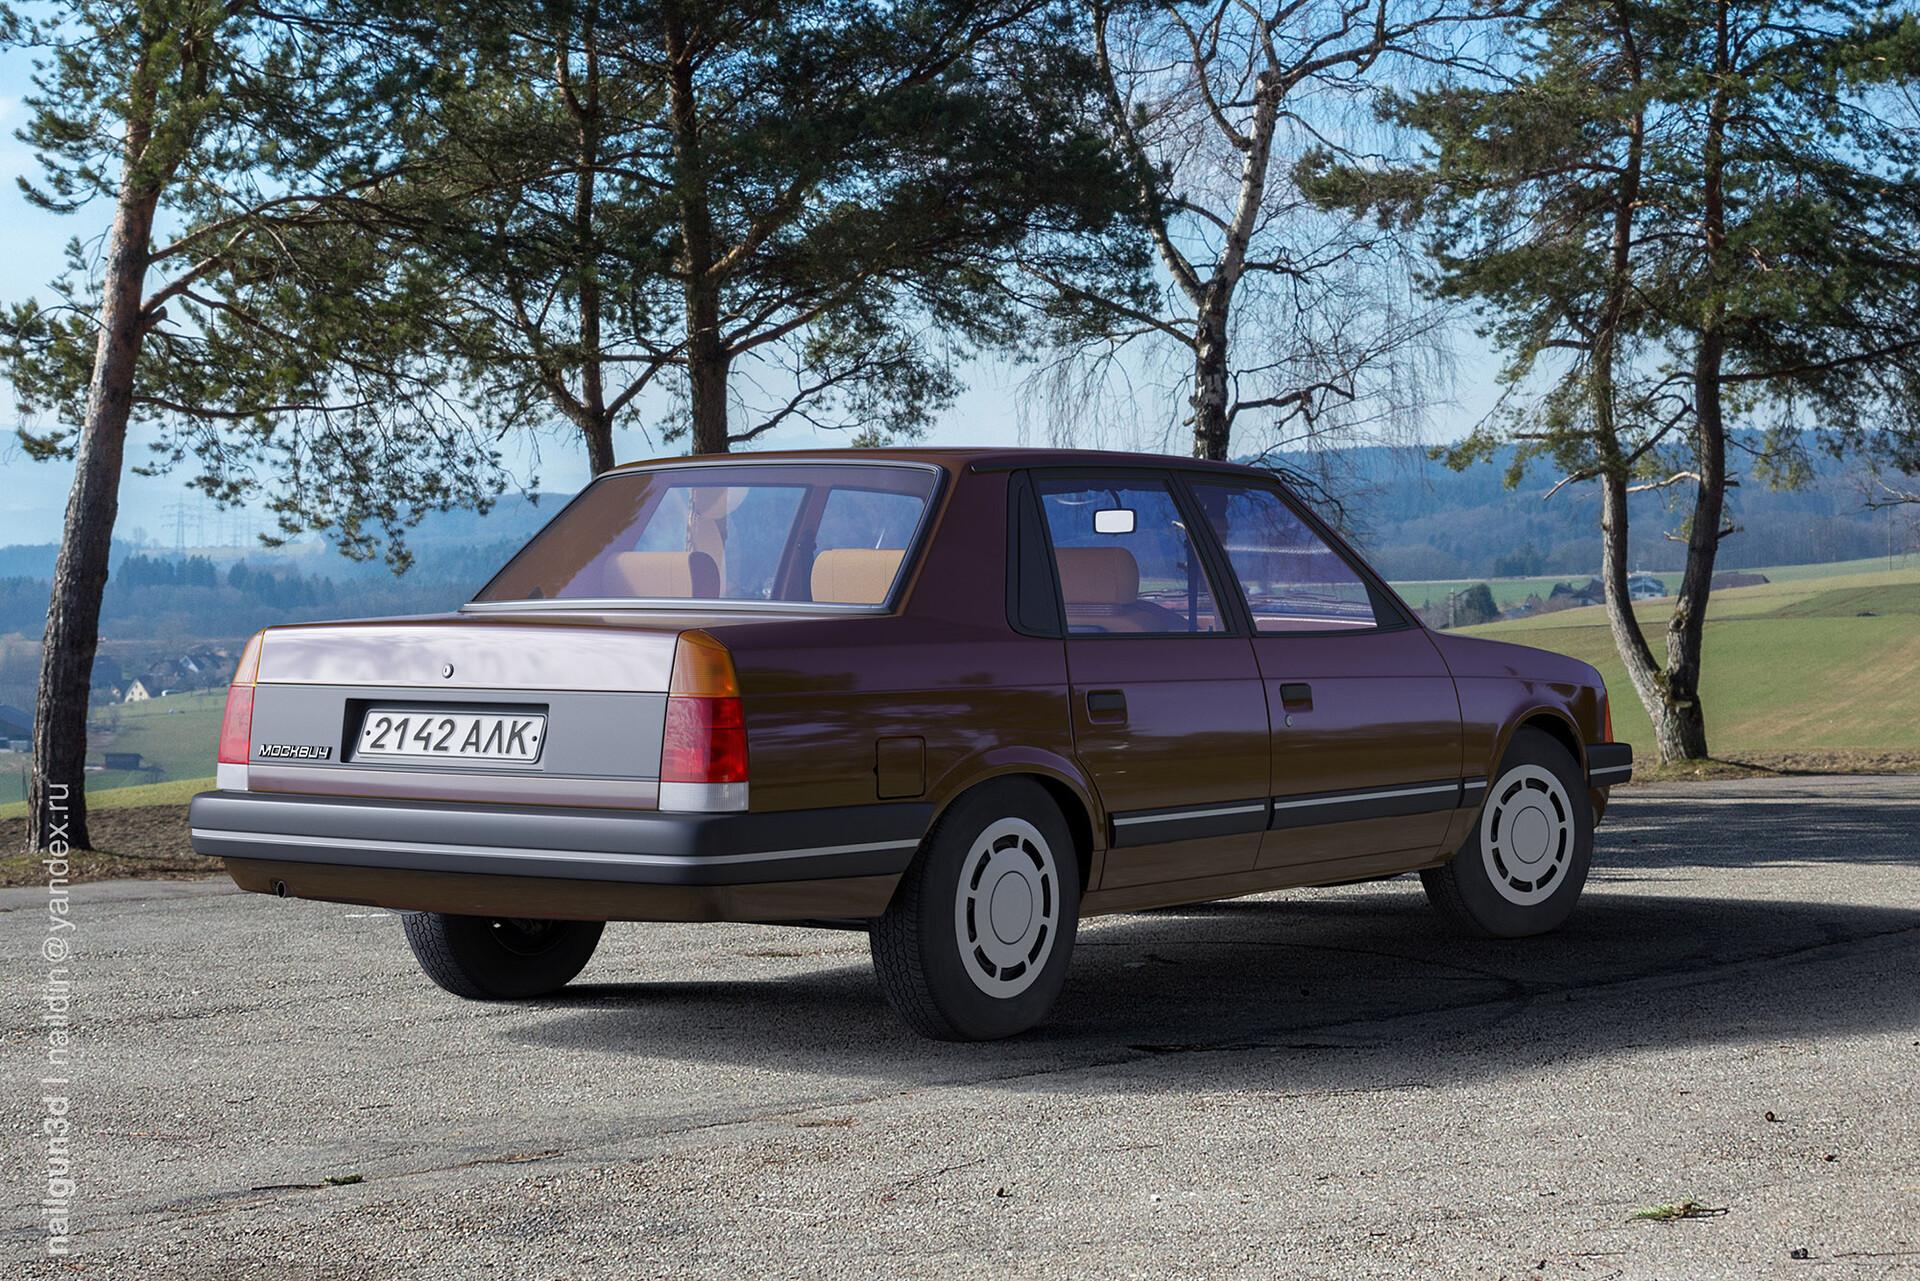 Nail khusnutdinov als 240 010 azlk 2142 rear view 3x